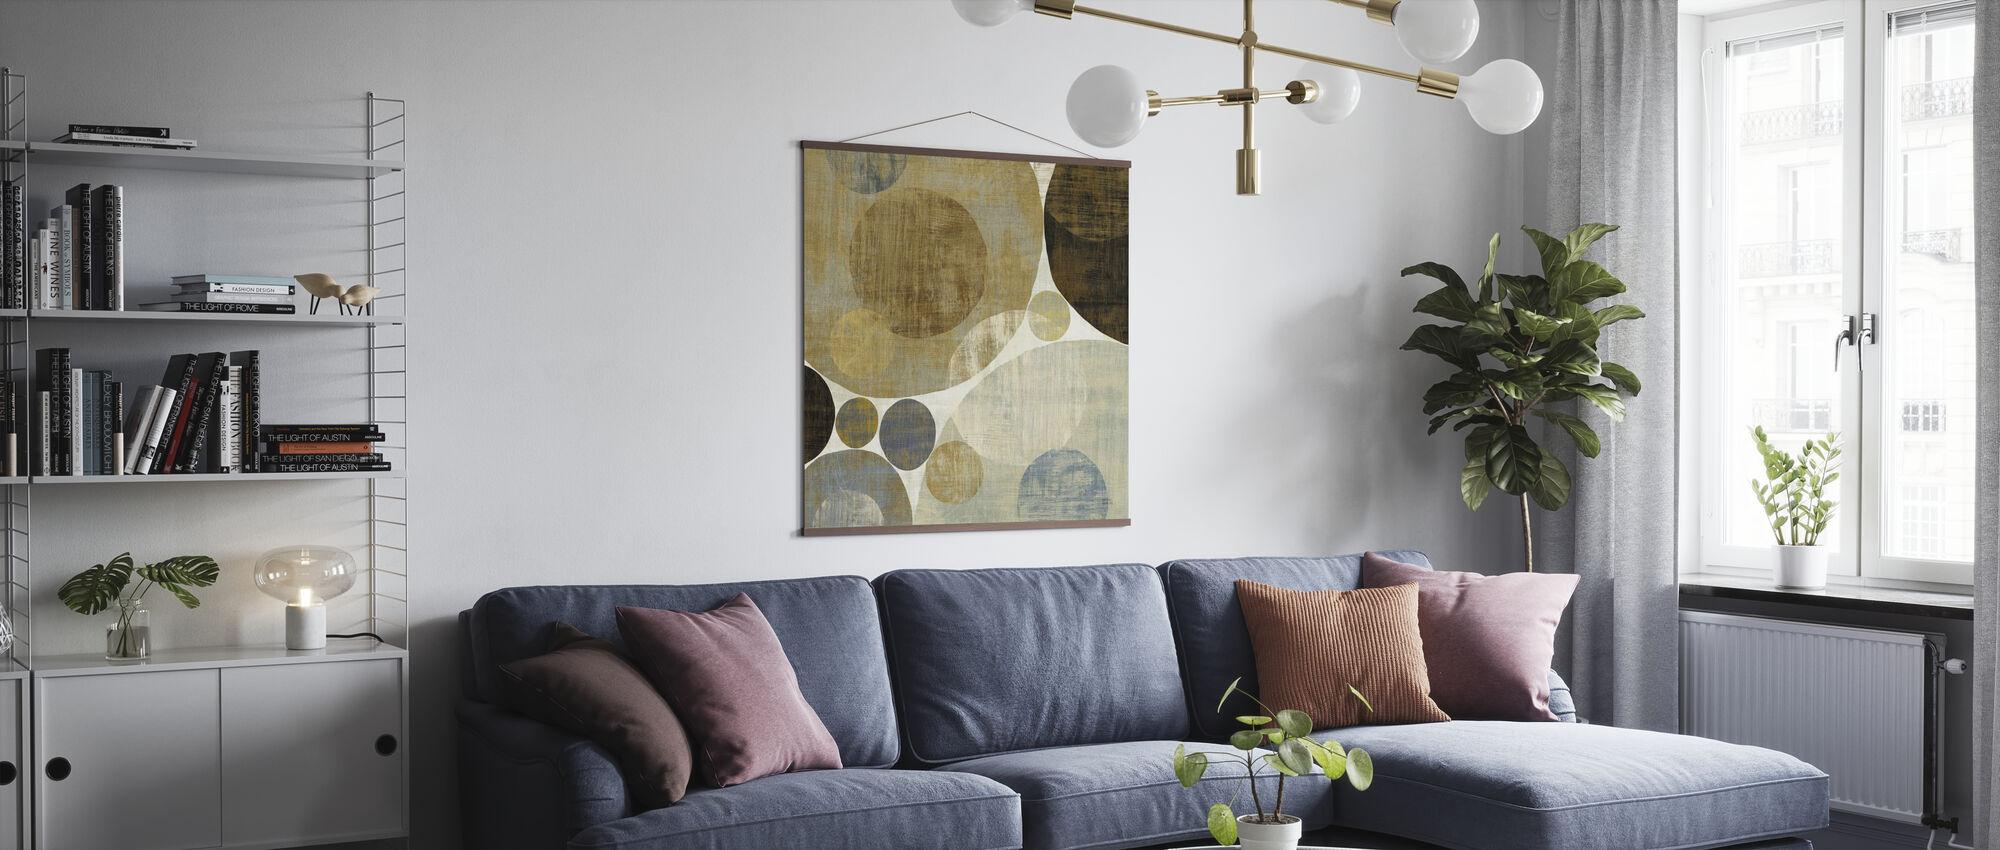 Circulation I - Poster - Living Room